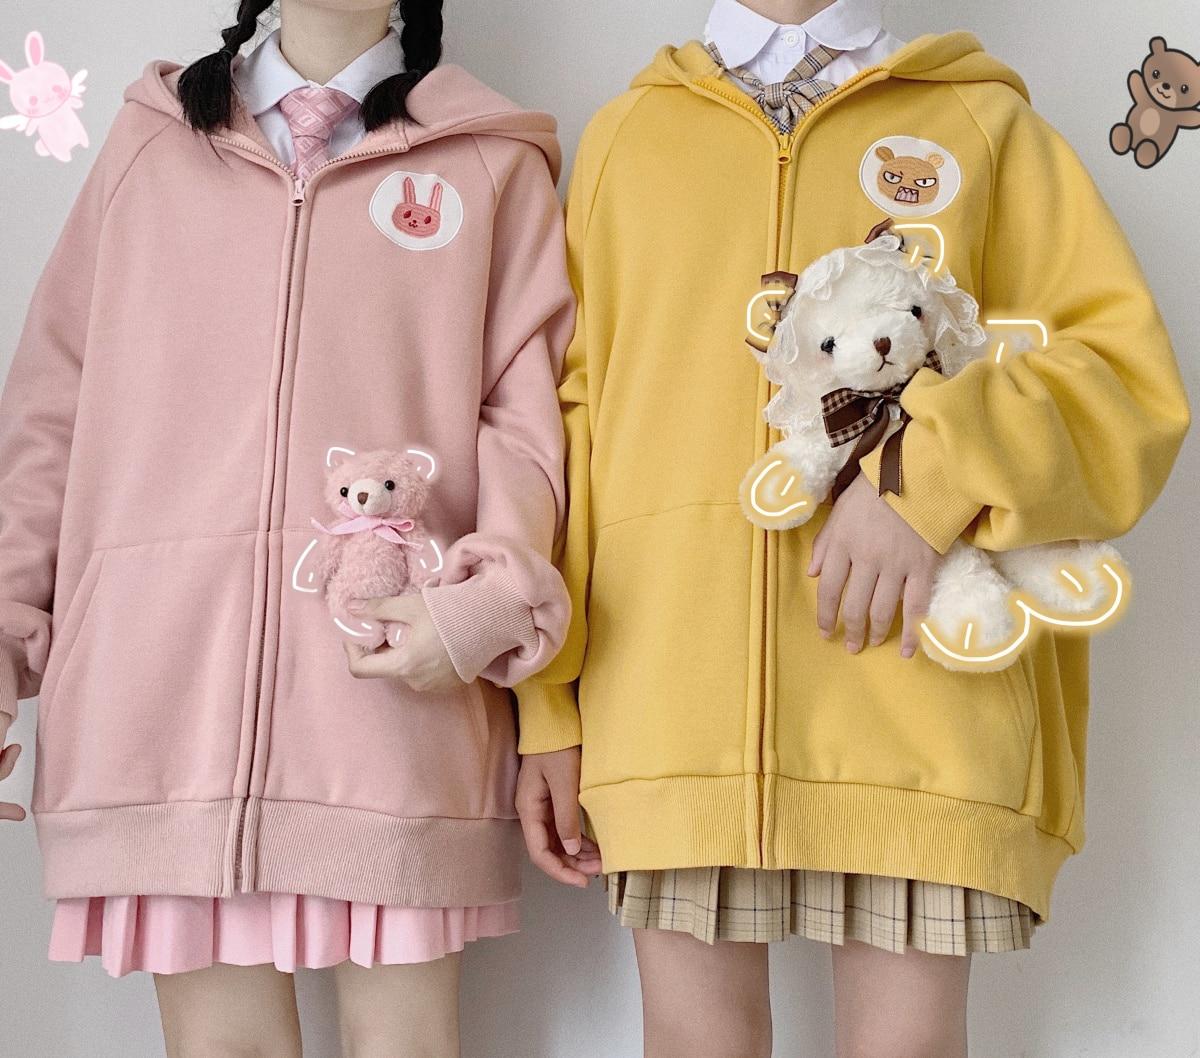 Anke polvos originales Huhu / Round / Milk Dragon Roar, otoño e invierno, nuevo estilo grueso, manga larga, gorro, suéter, abrigo